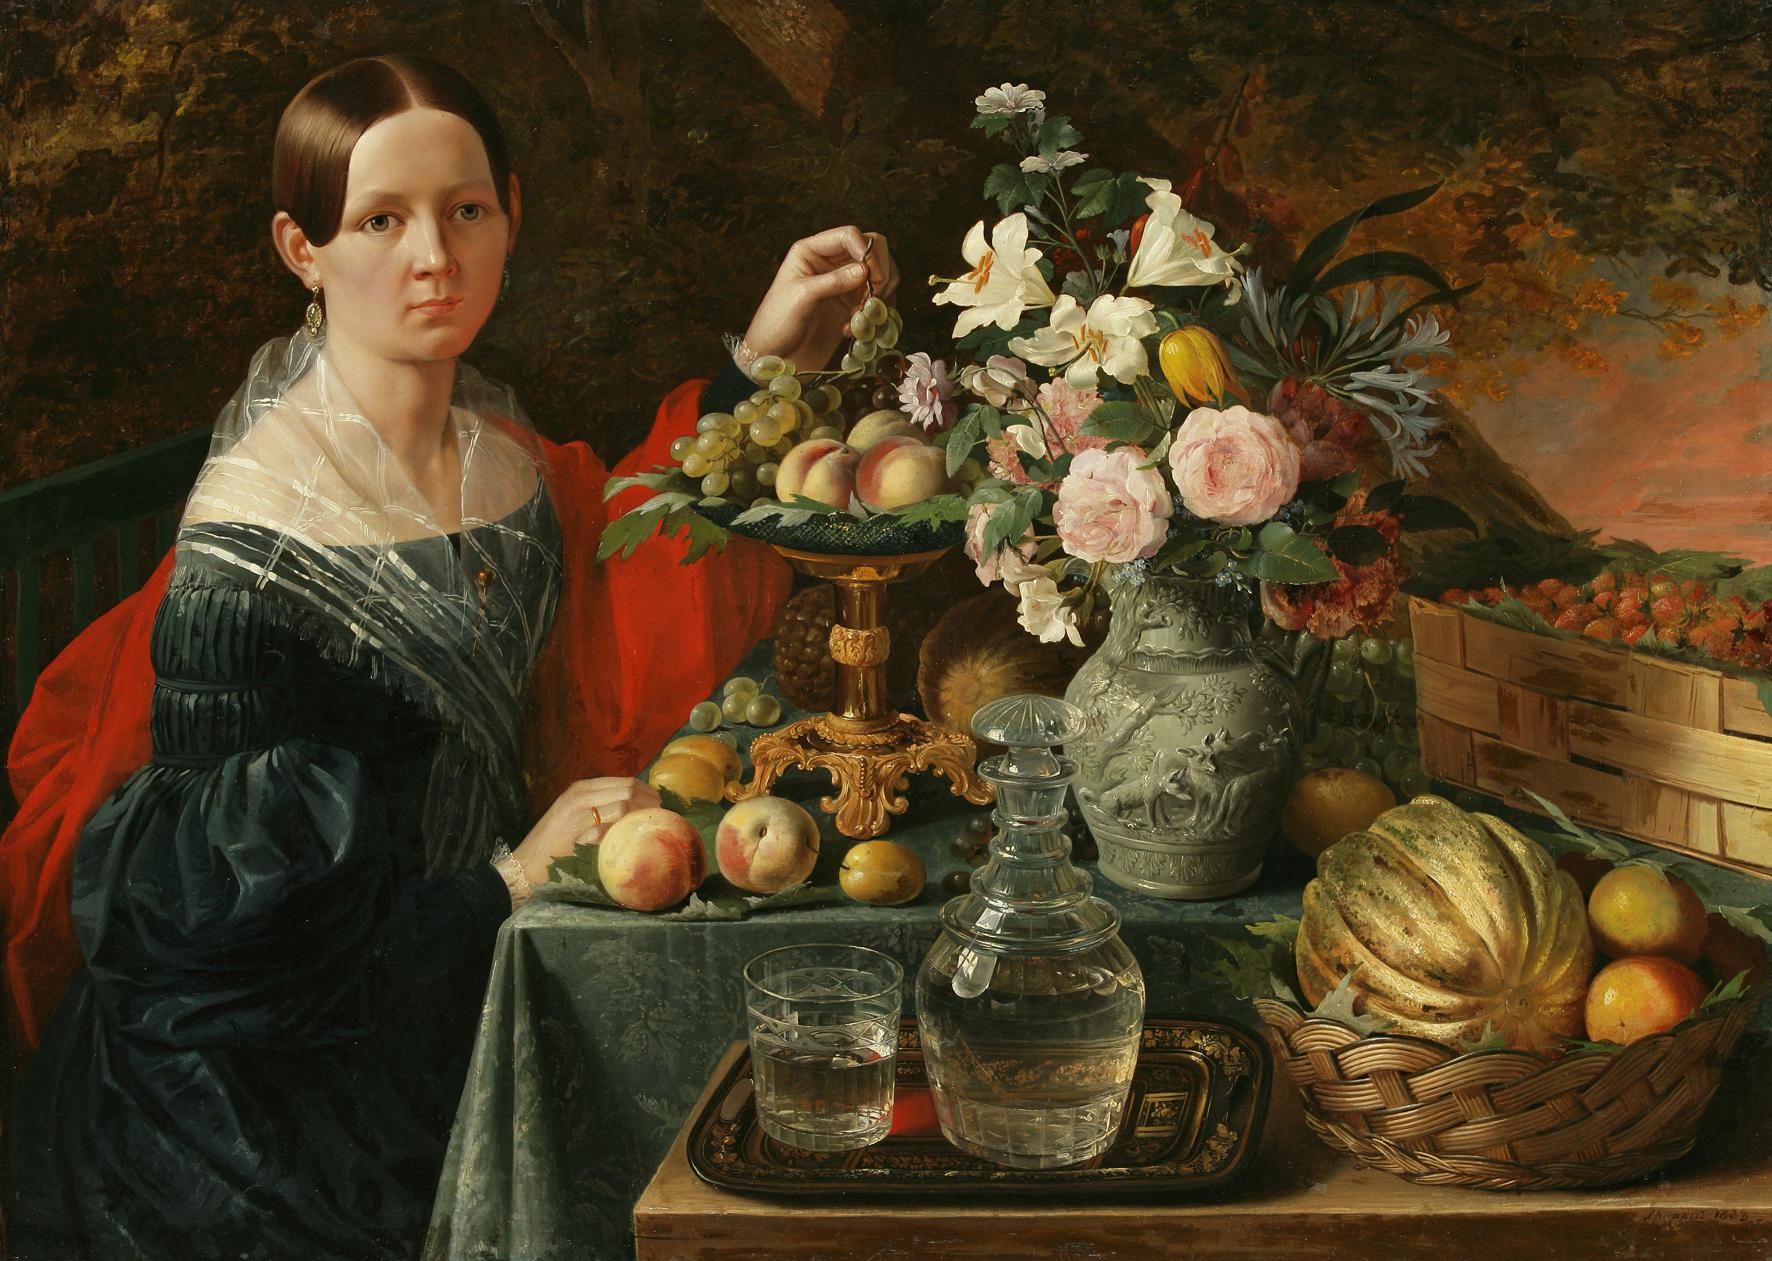 Jan_Chrucki._Partret_nieviadomaj_z_kvietkami_i_fruktami,_1838